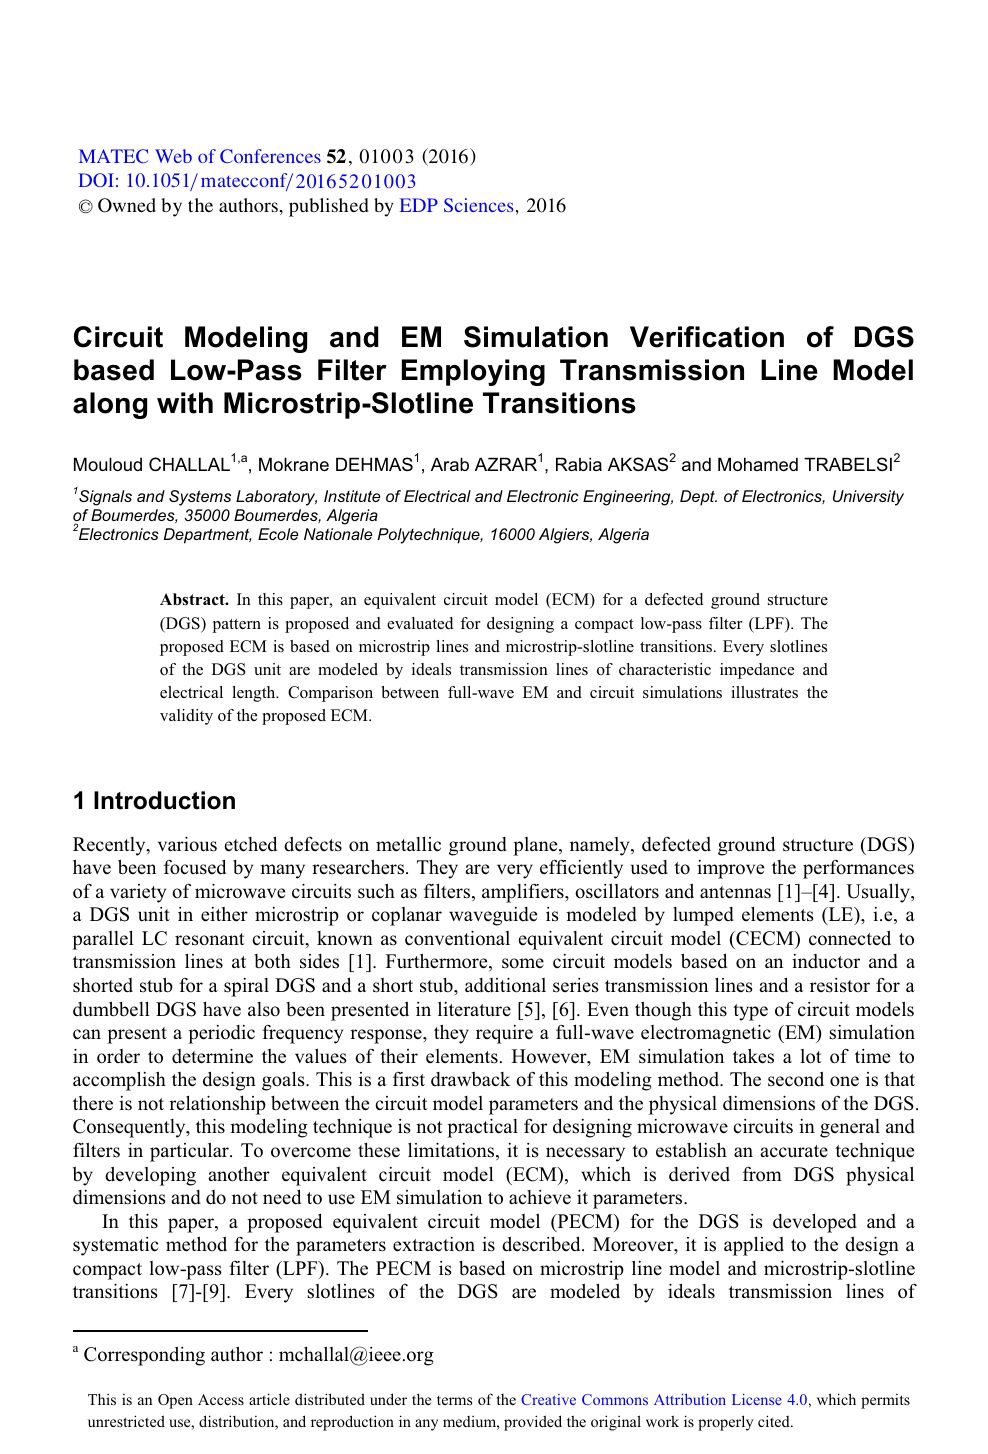 Circuit Modeling and EM Simulation Verification of DGS based